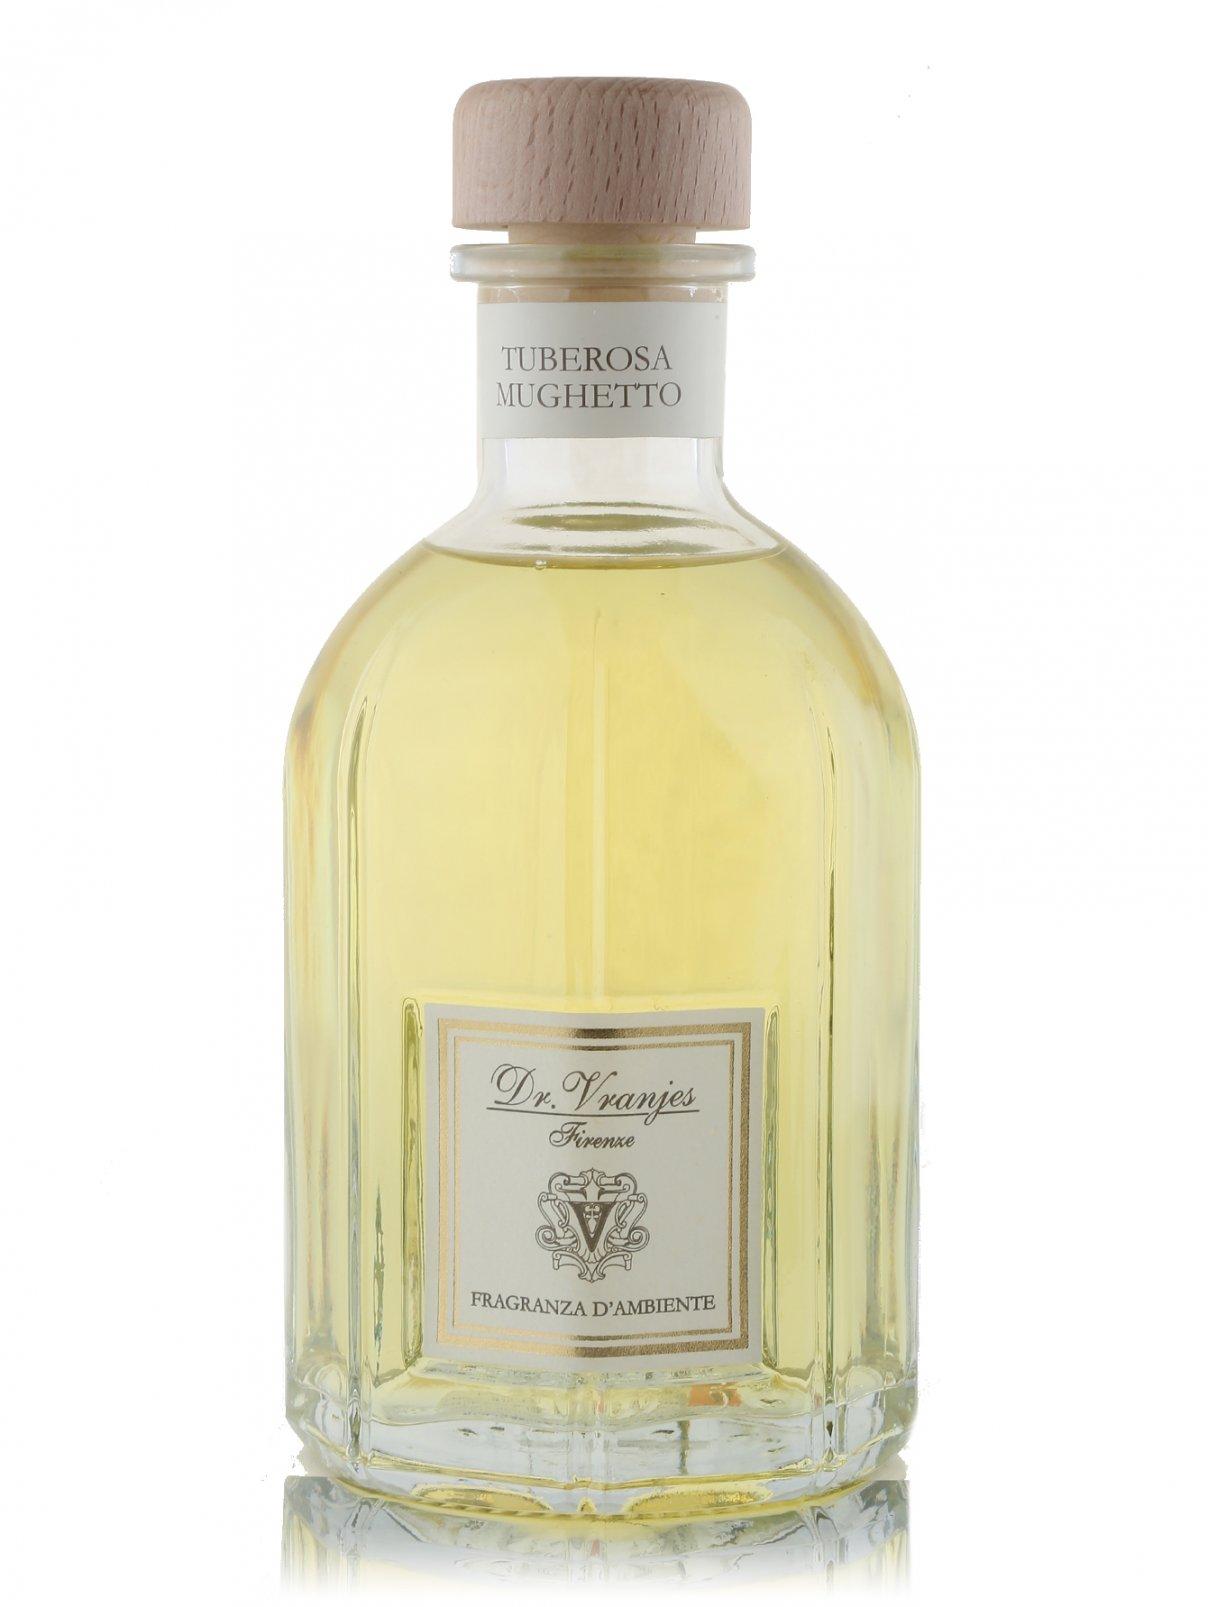 Ароматизатор воздуха - Tuberosa Mughetto, Home Fragrance, 500ml Dr. Vranjes  –  Общий вид